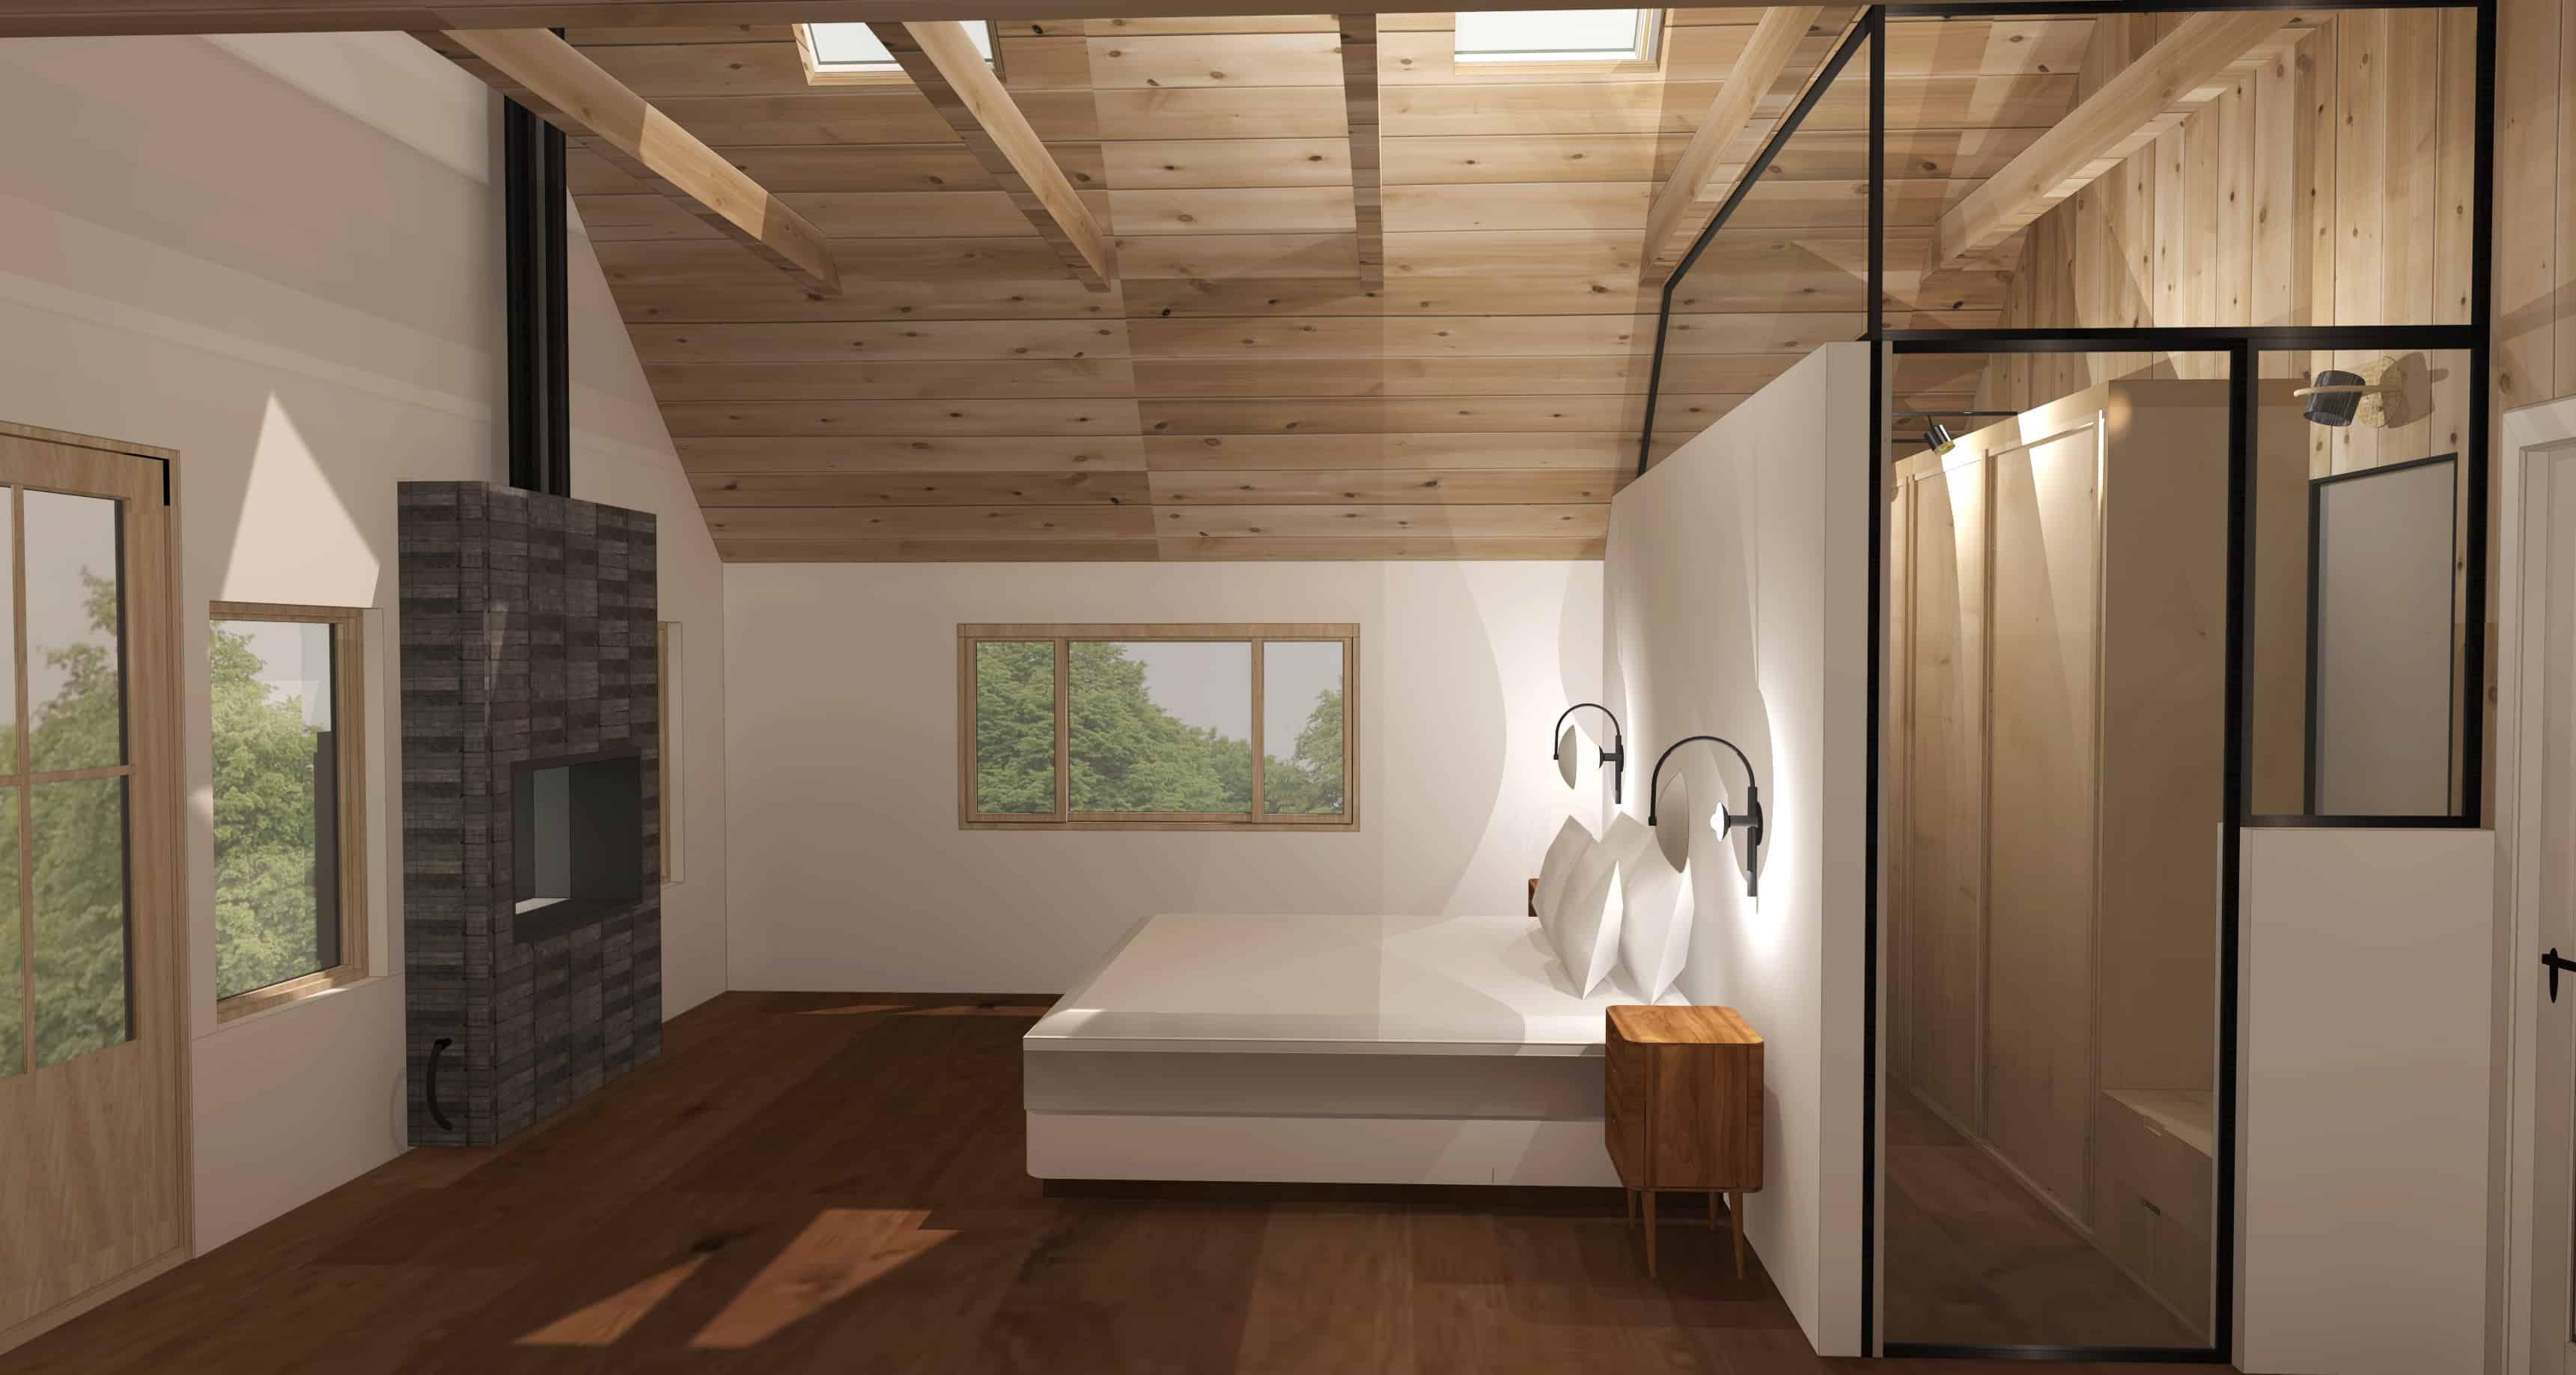 8.8.18 Master Bedroom 1for Rendering 2018 08 20 11020200000 1